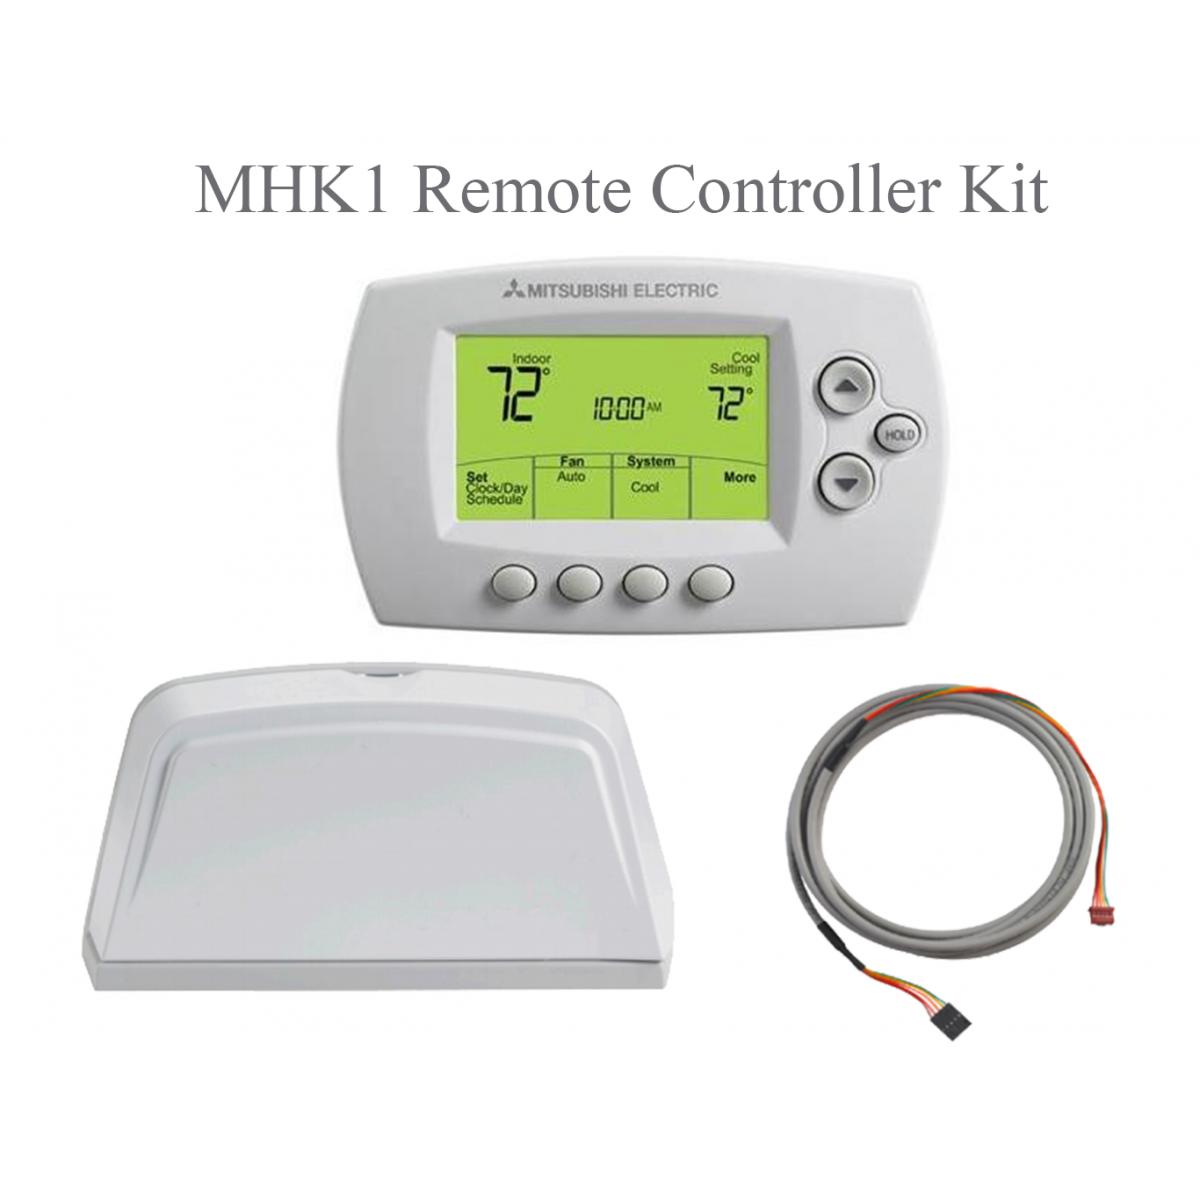 mxz 2c20na split air conditioning and heating 20k btu 2 indoormhk1 remote control kit